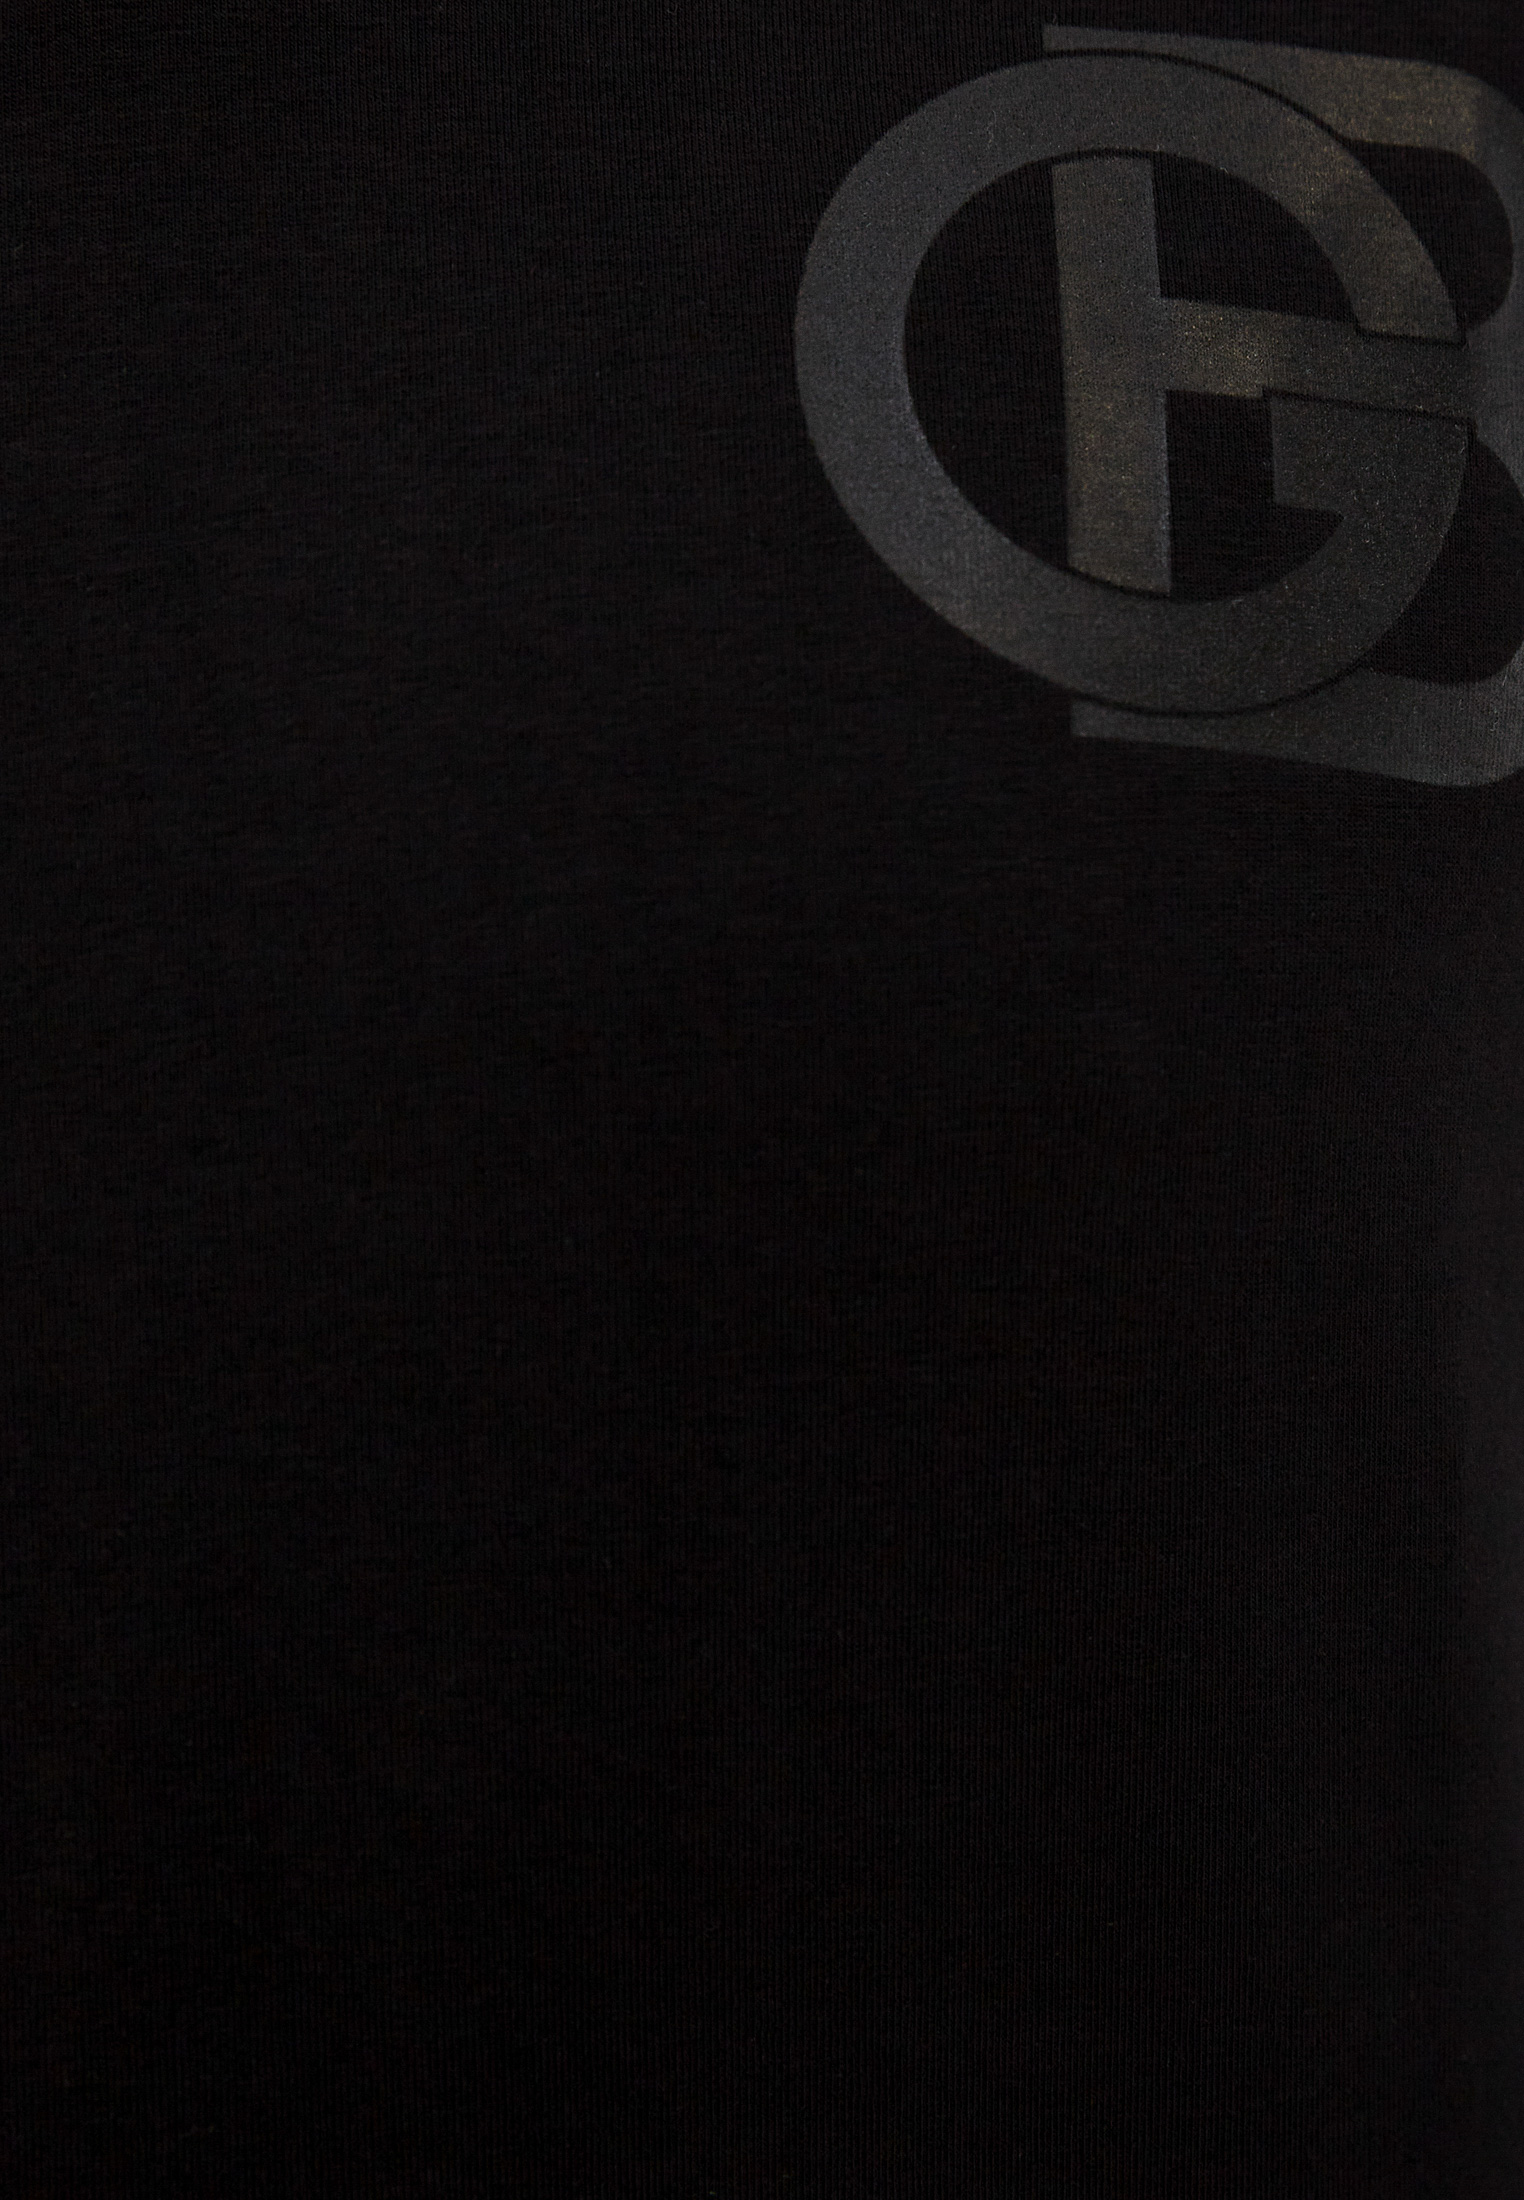 Мужская футболка Baldinini (Балдинини) TSU02: изображение 5